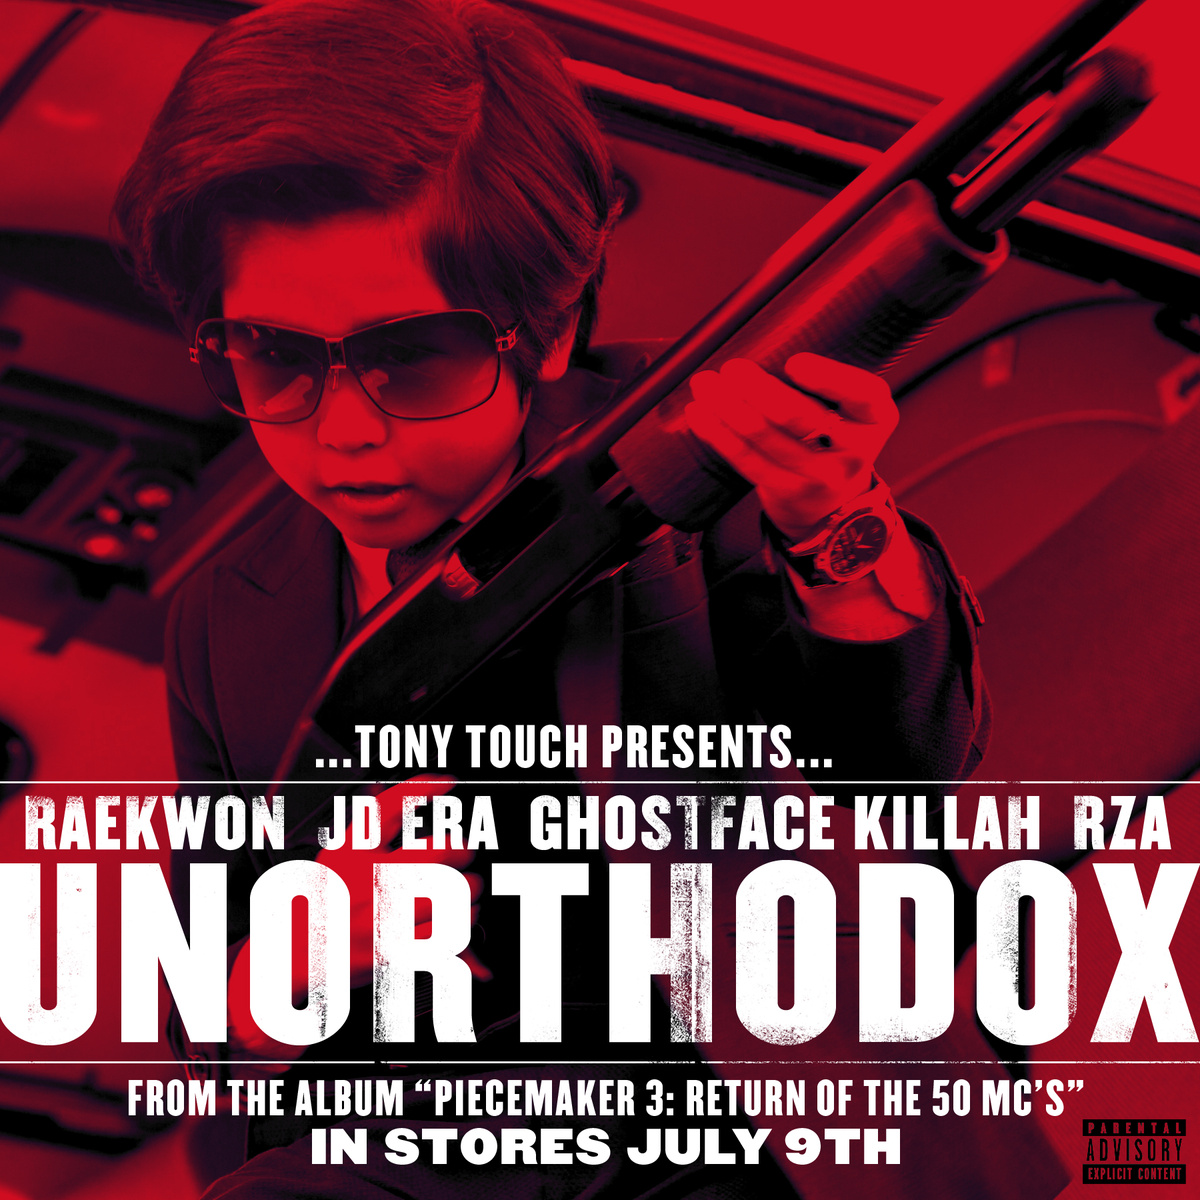 Tony Touch presents Raekwon, JD Era, Ghostface KIllah and The RZA - Unorthodox [audio]